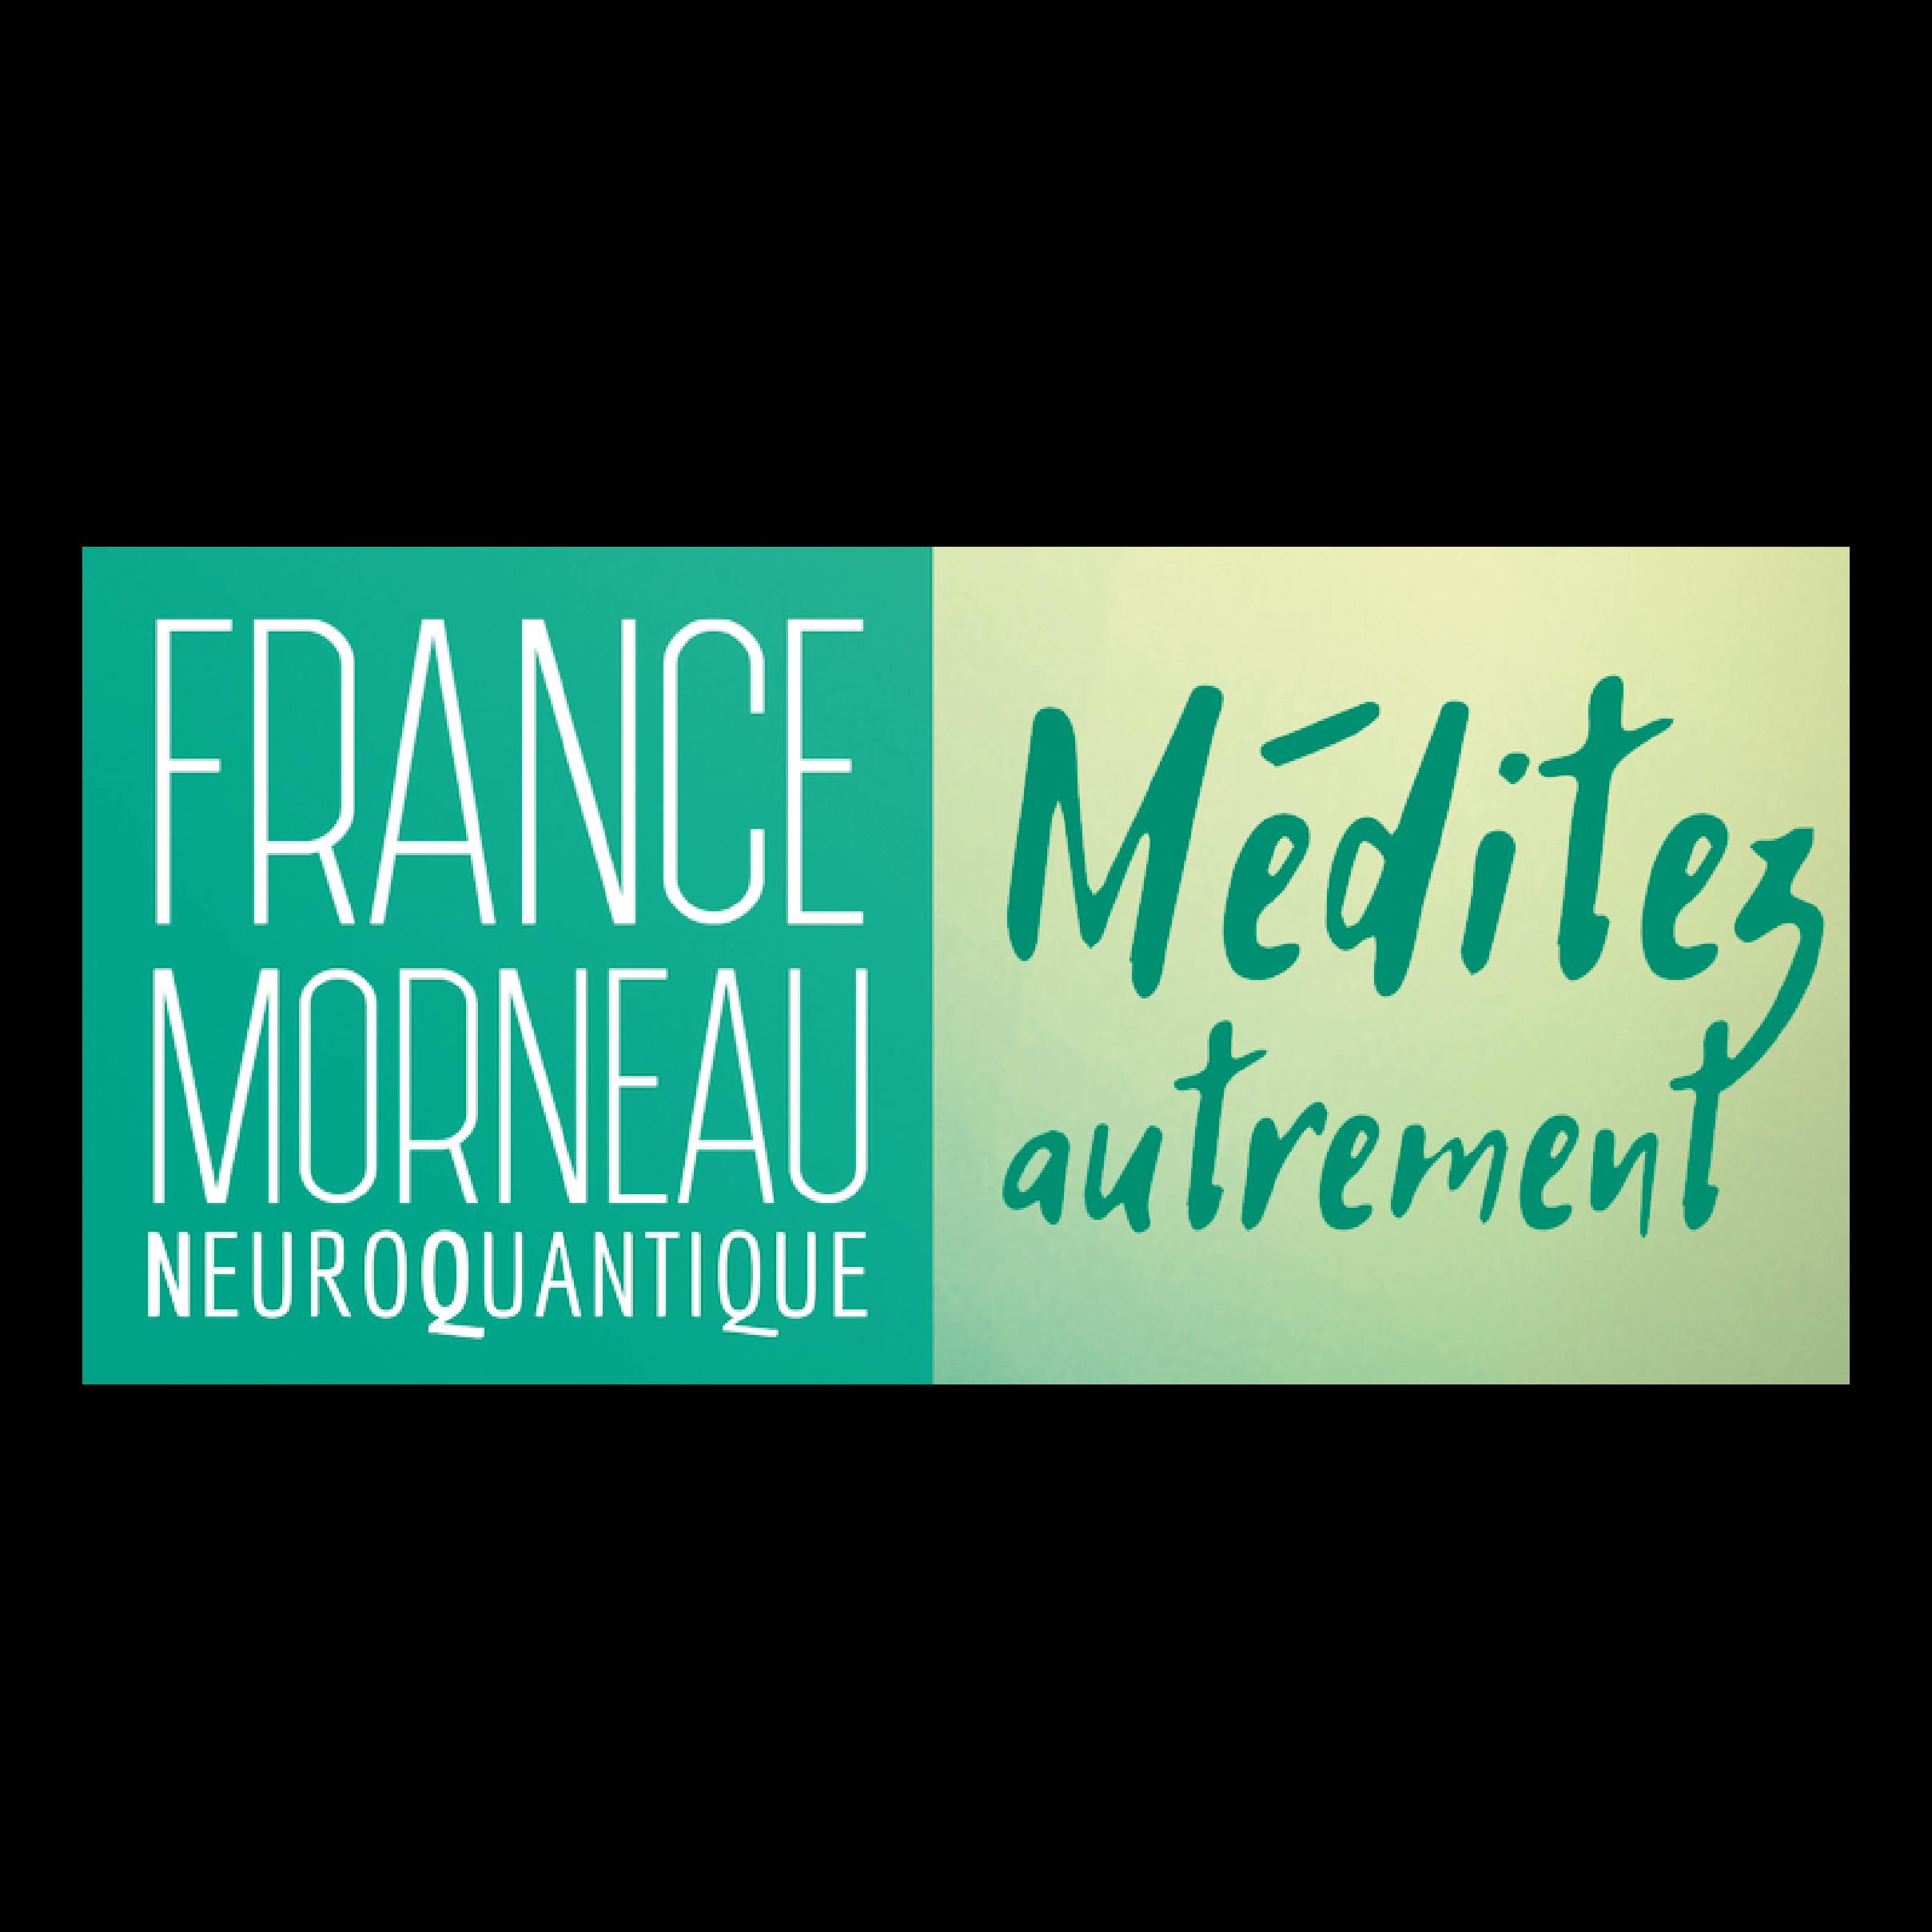 France Morneau